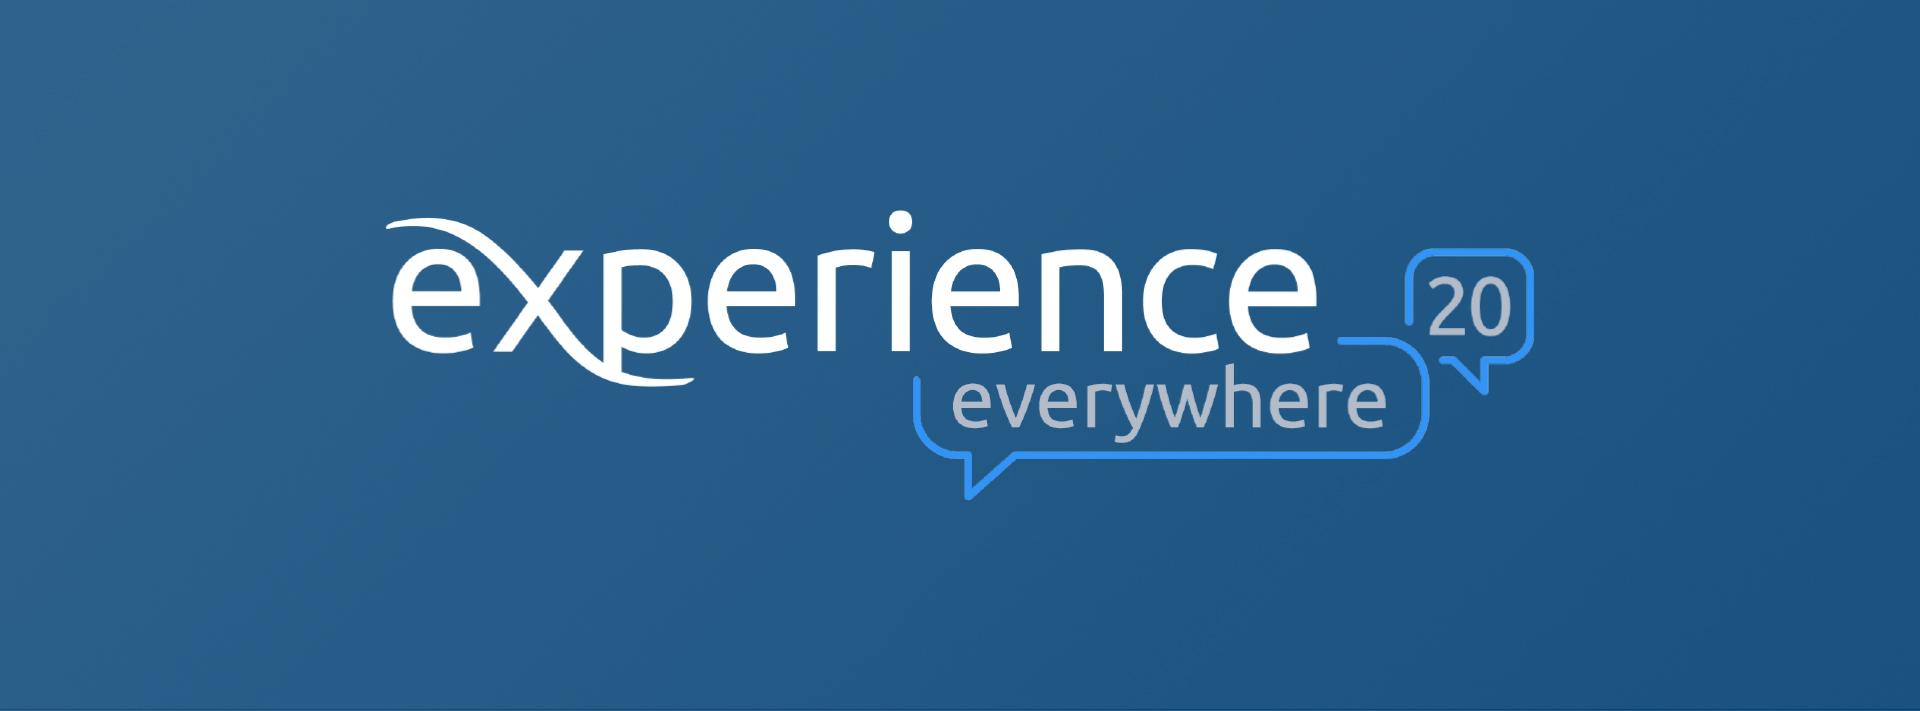 serviceware-blog-nexthink-experience-everywhere